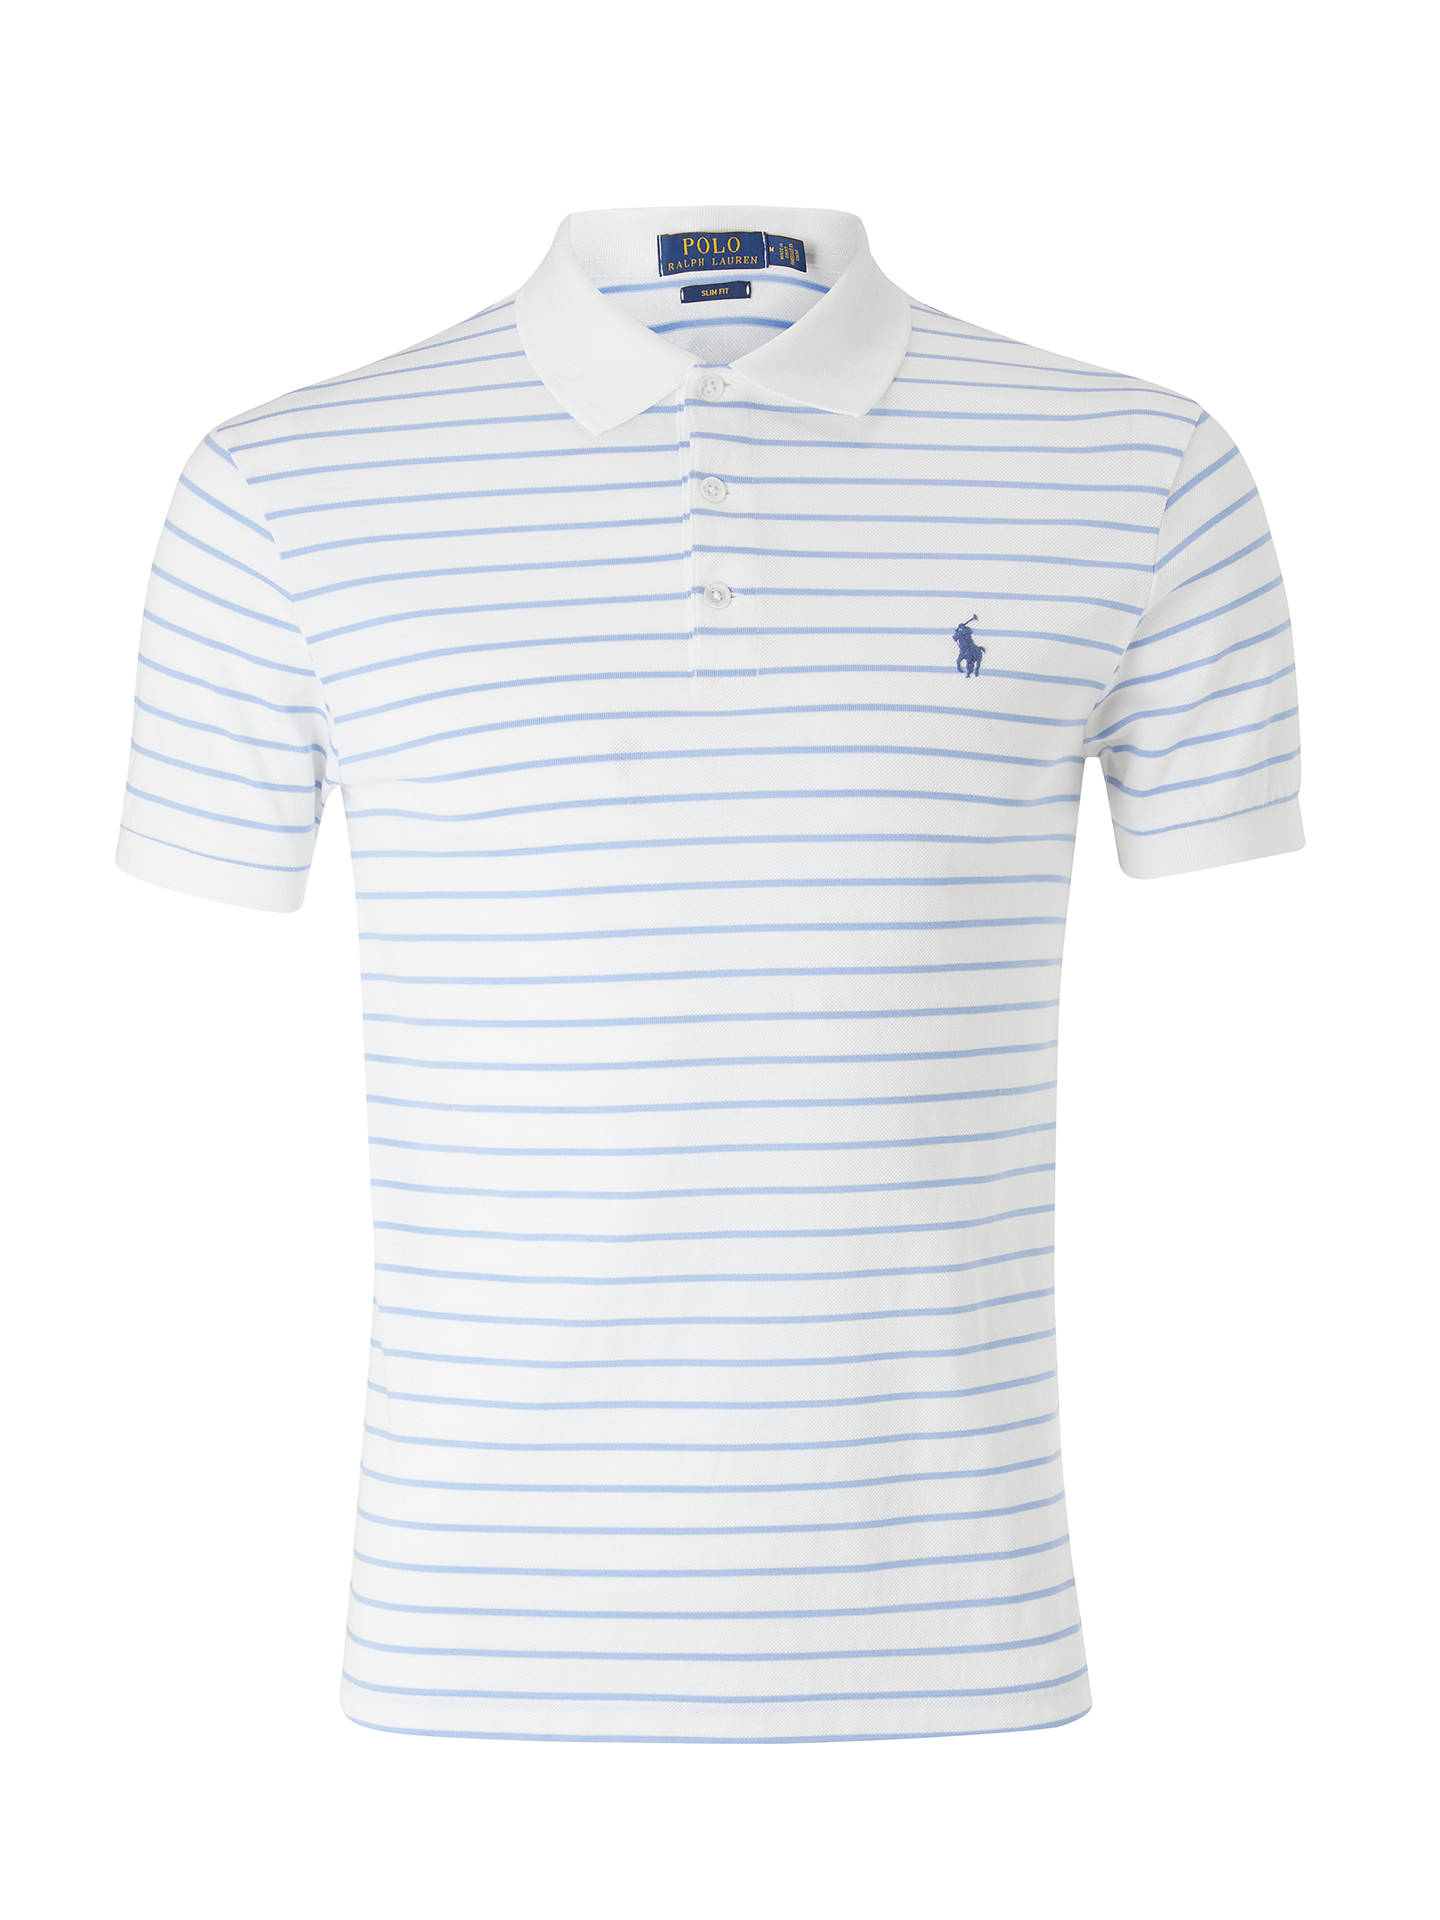 85bfe9e3 ... buy buypolo ralph lauren slim fit stretch stripe polo shirt white blue  s online 098b1 25af0